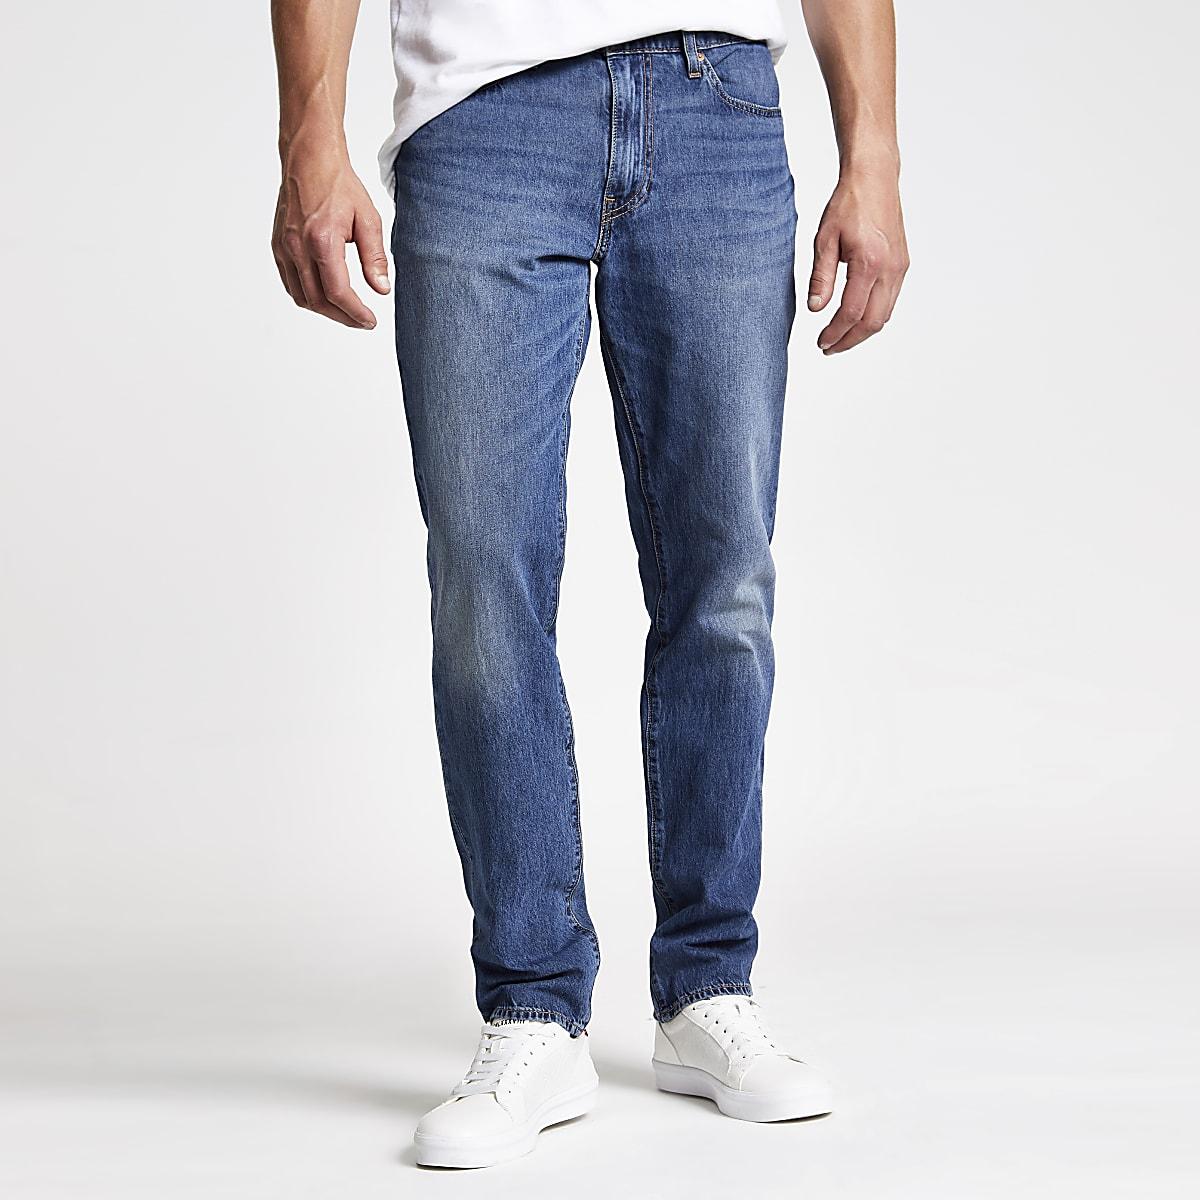 Levi's - Blauwe 511 slim-fit jeans